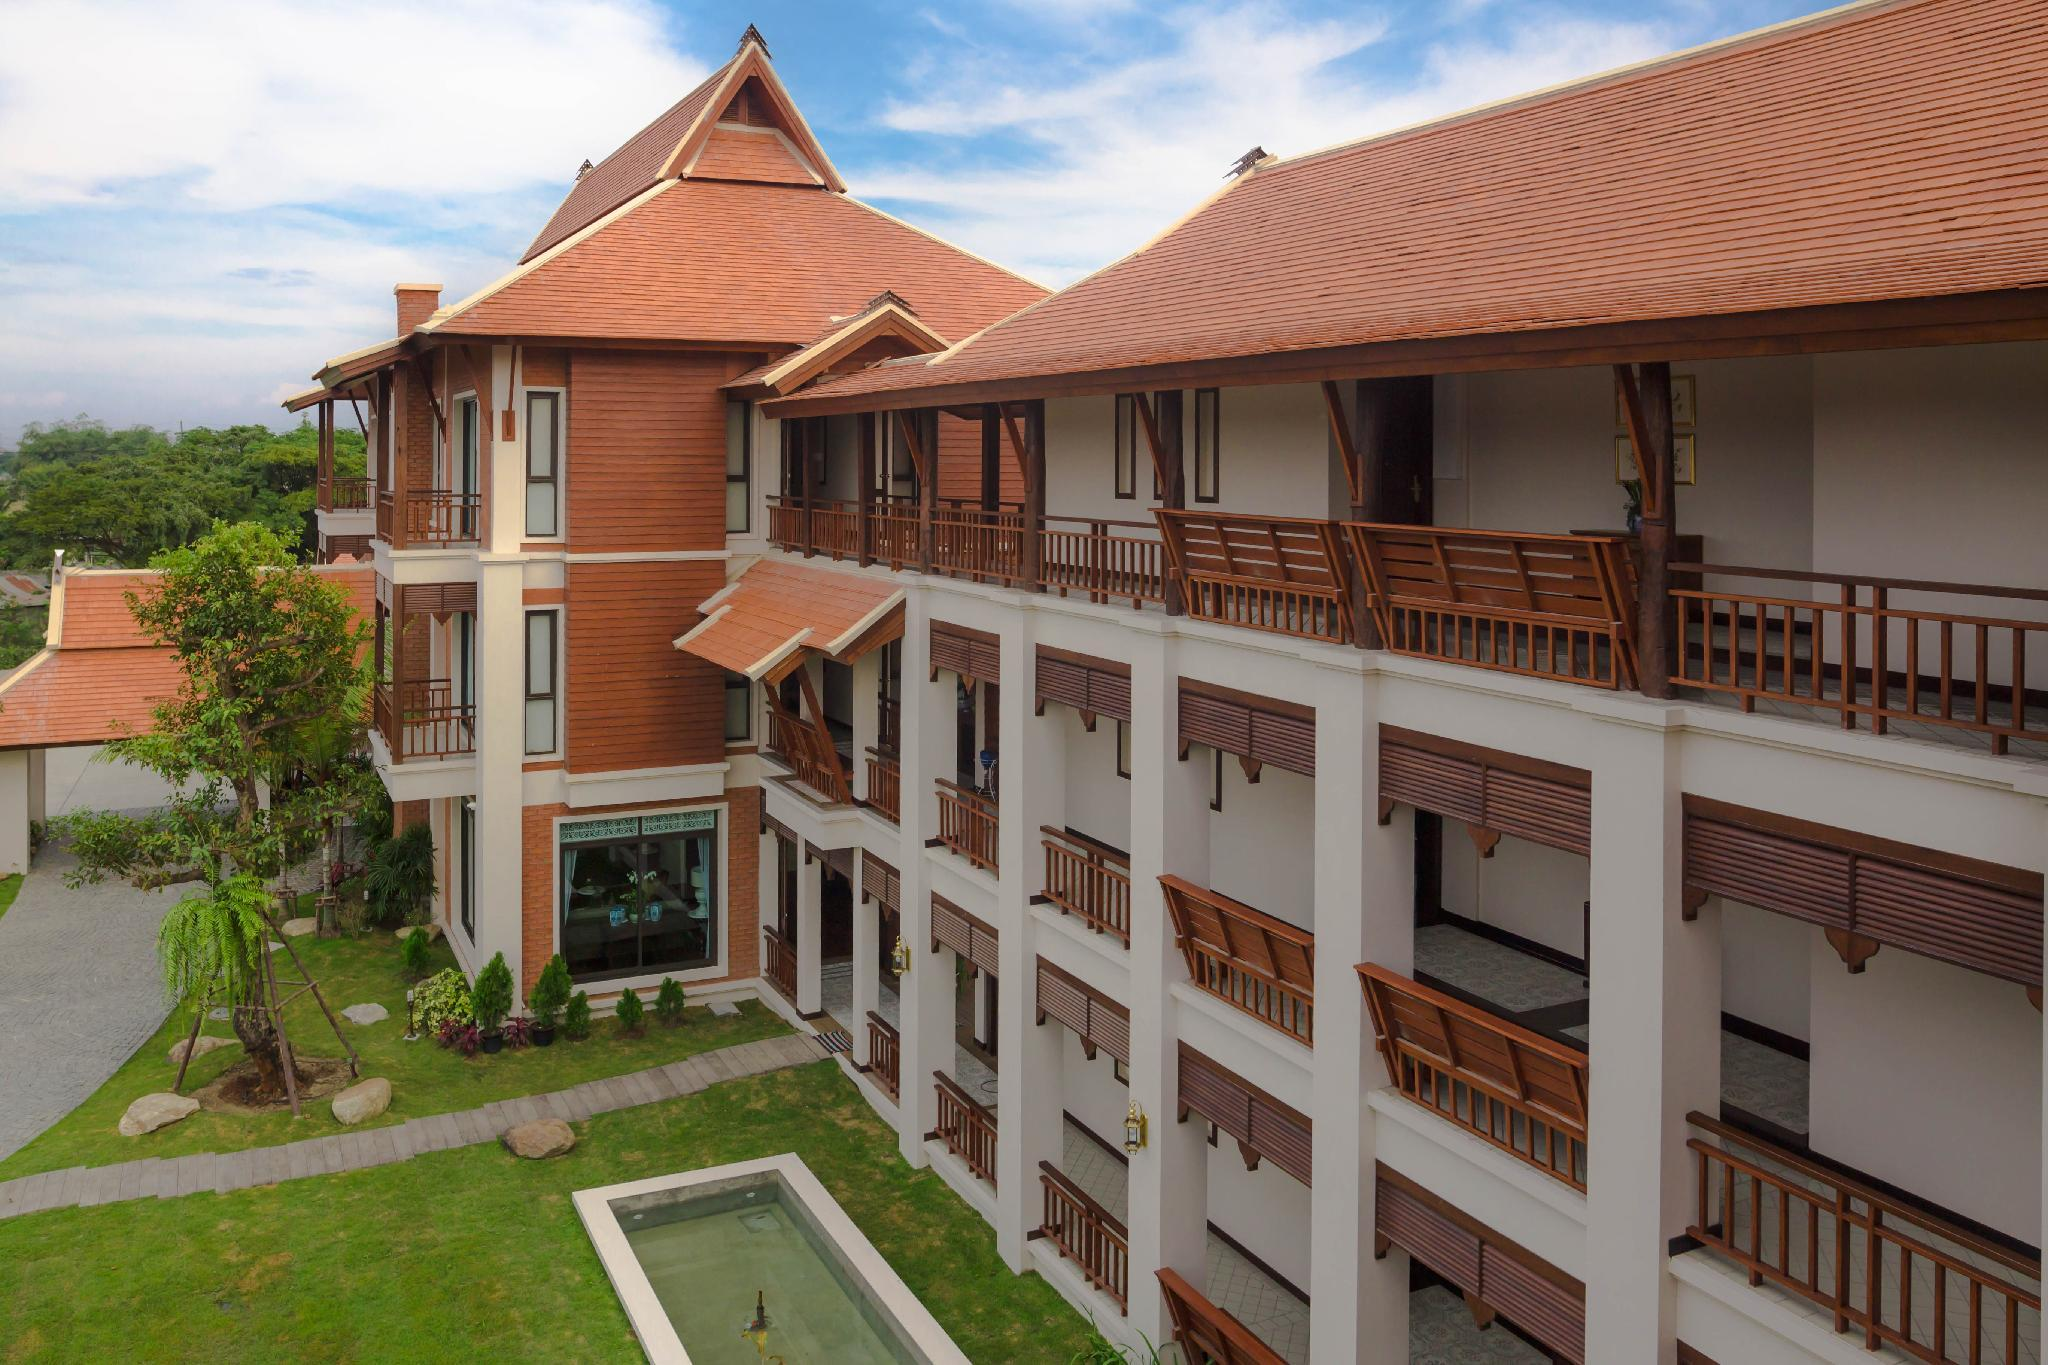 Content Villa Chiang Mai,คอนเทนต์ วิลลา เชียงใหม่